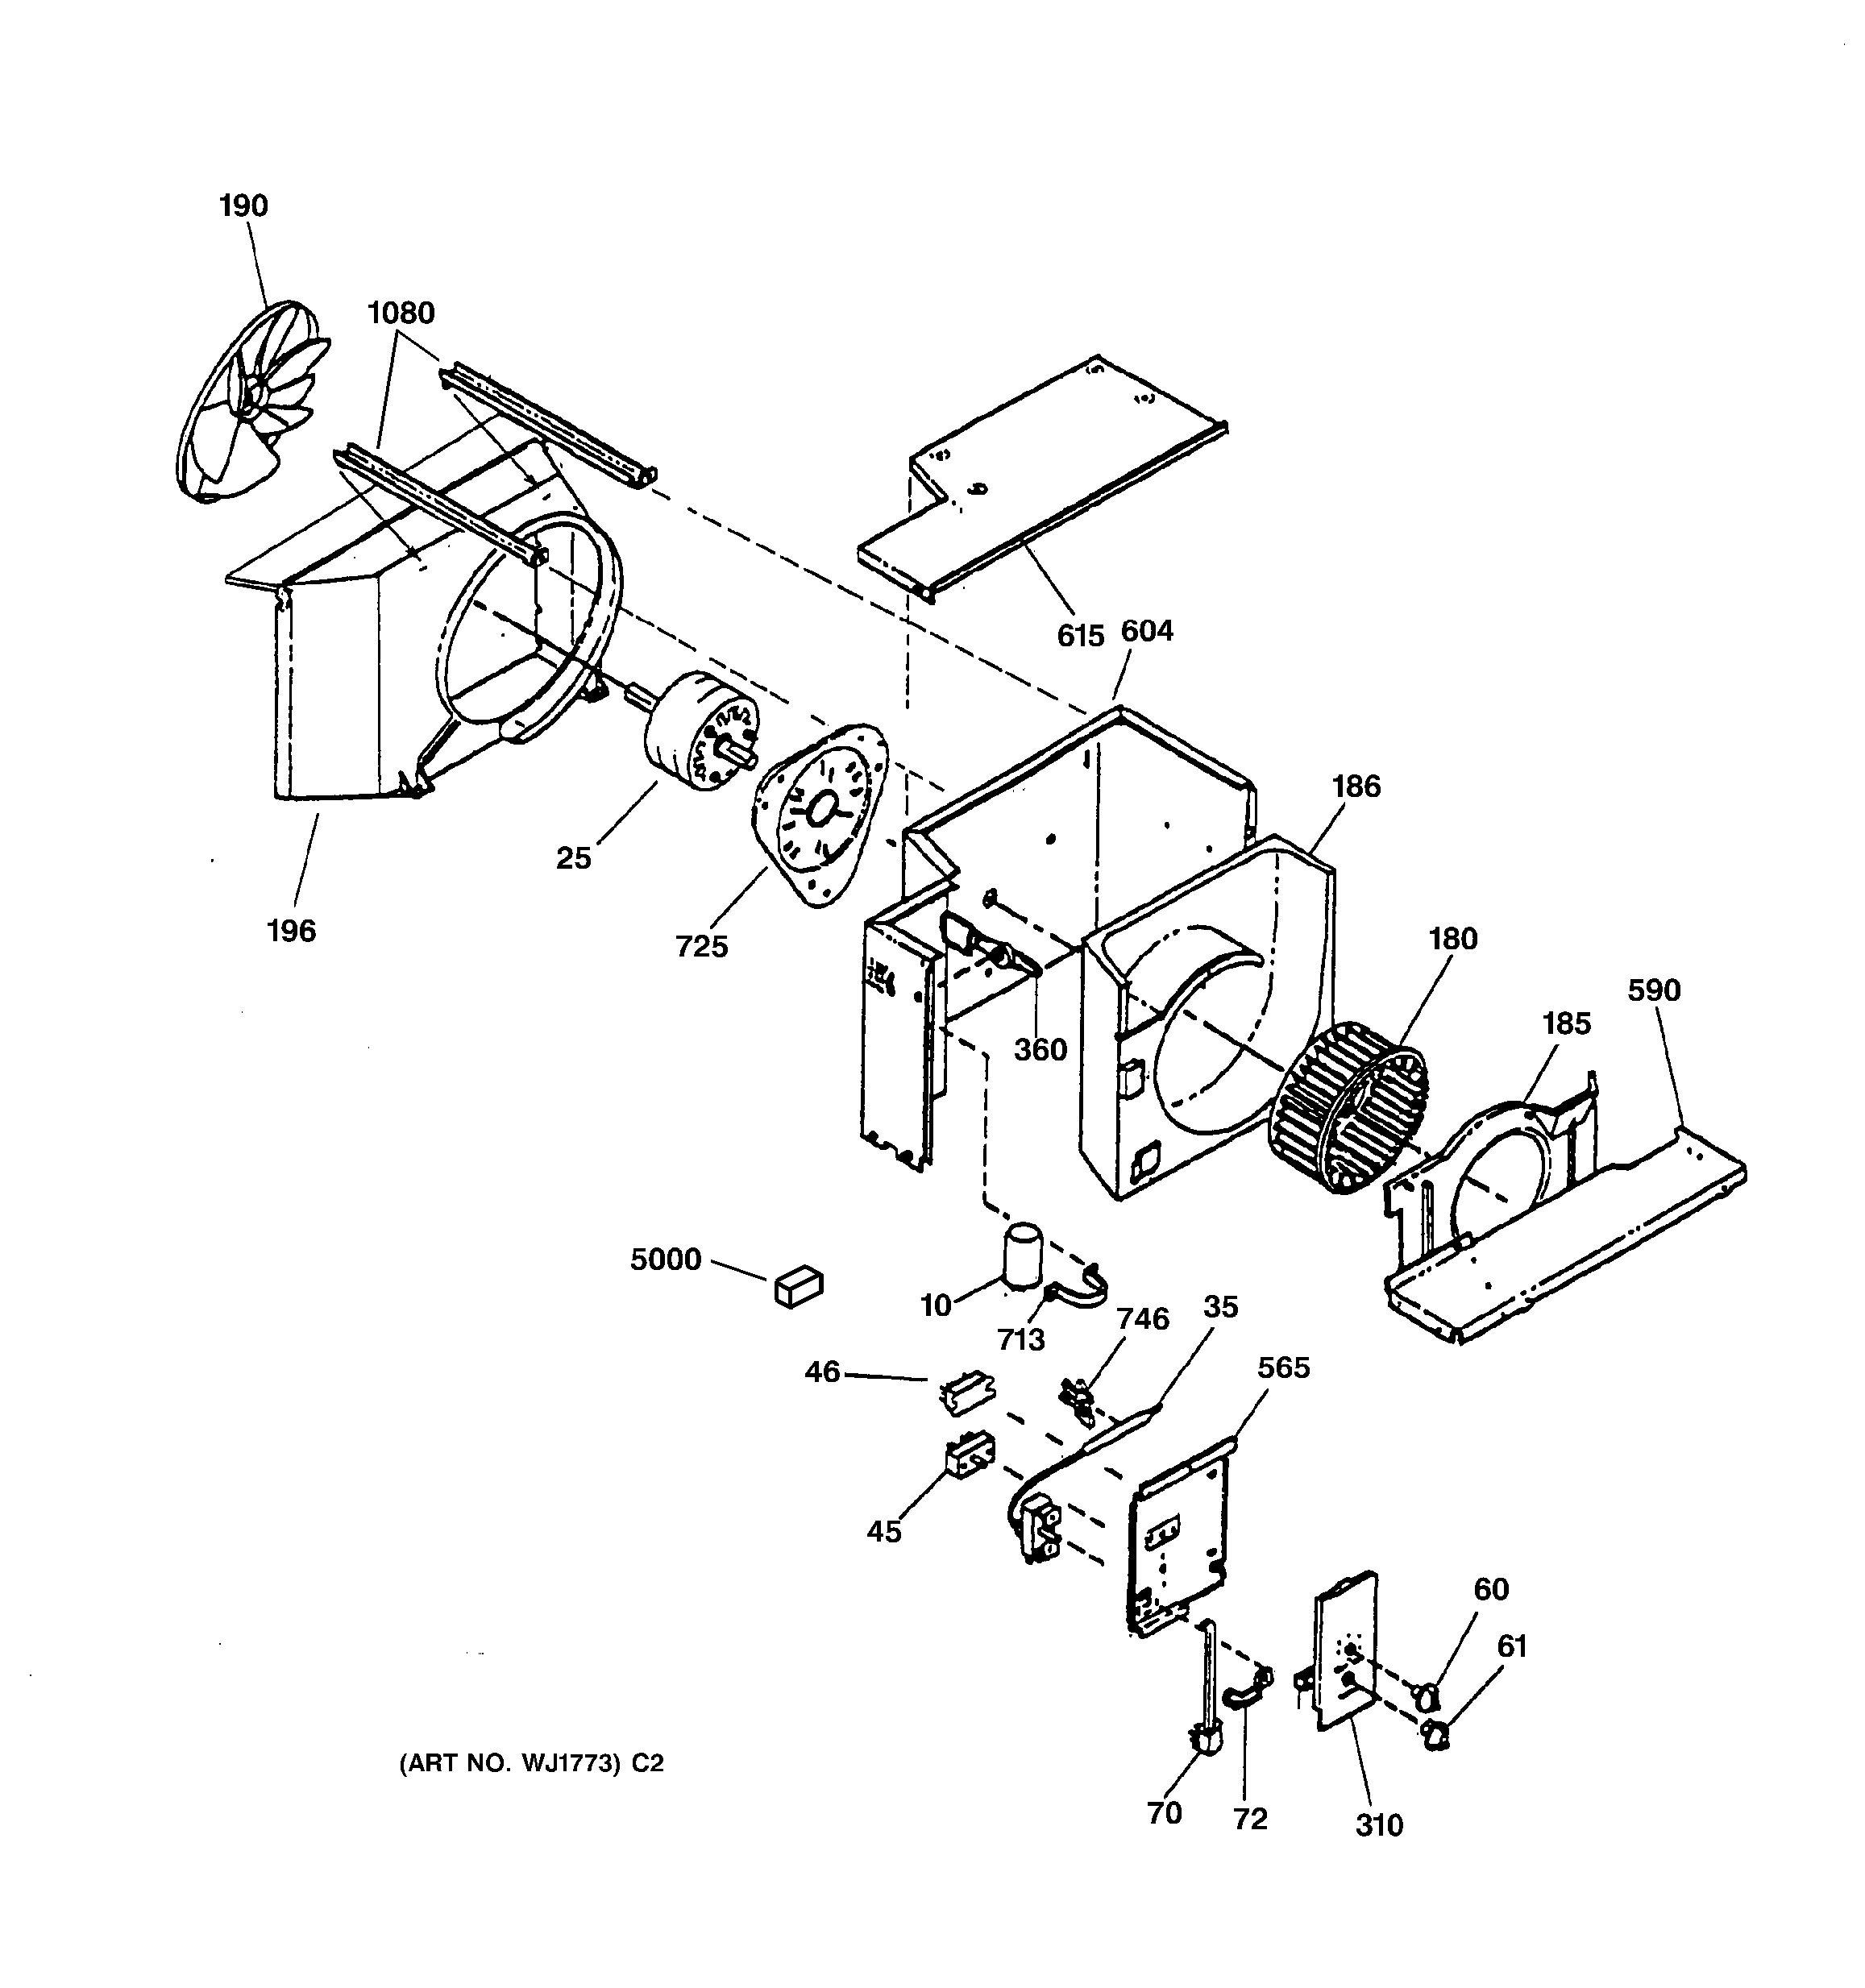 goodman air handler wiring diagrams as well condensing unit wiring